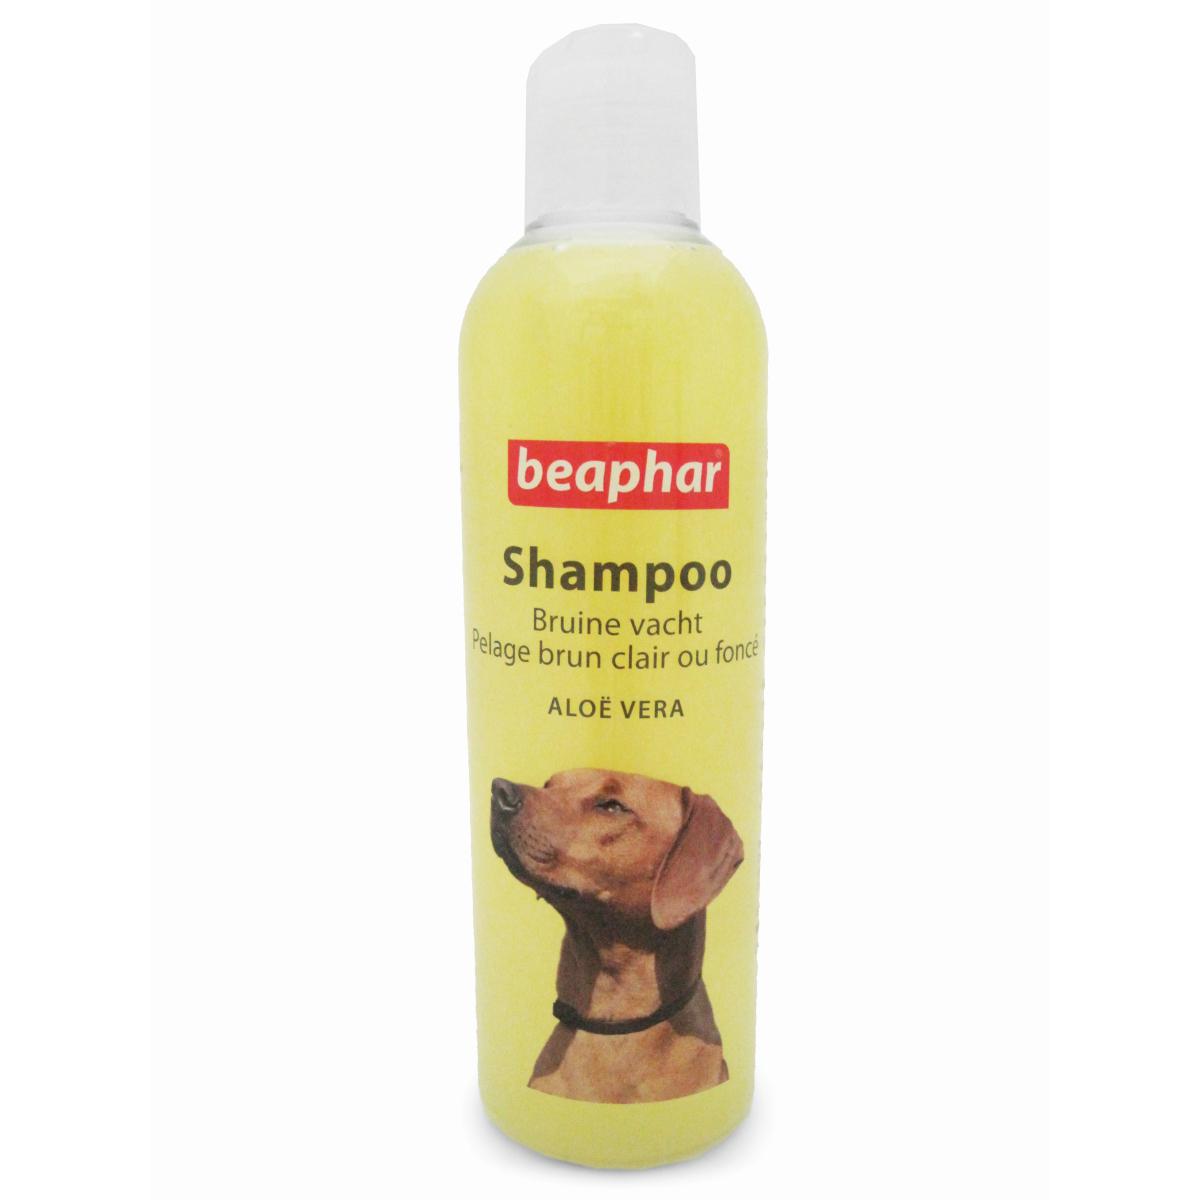 Shampoo bruine vacht geel 250 ml